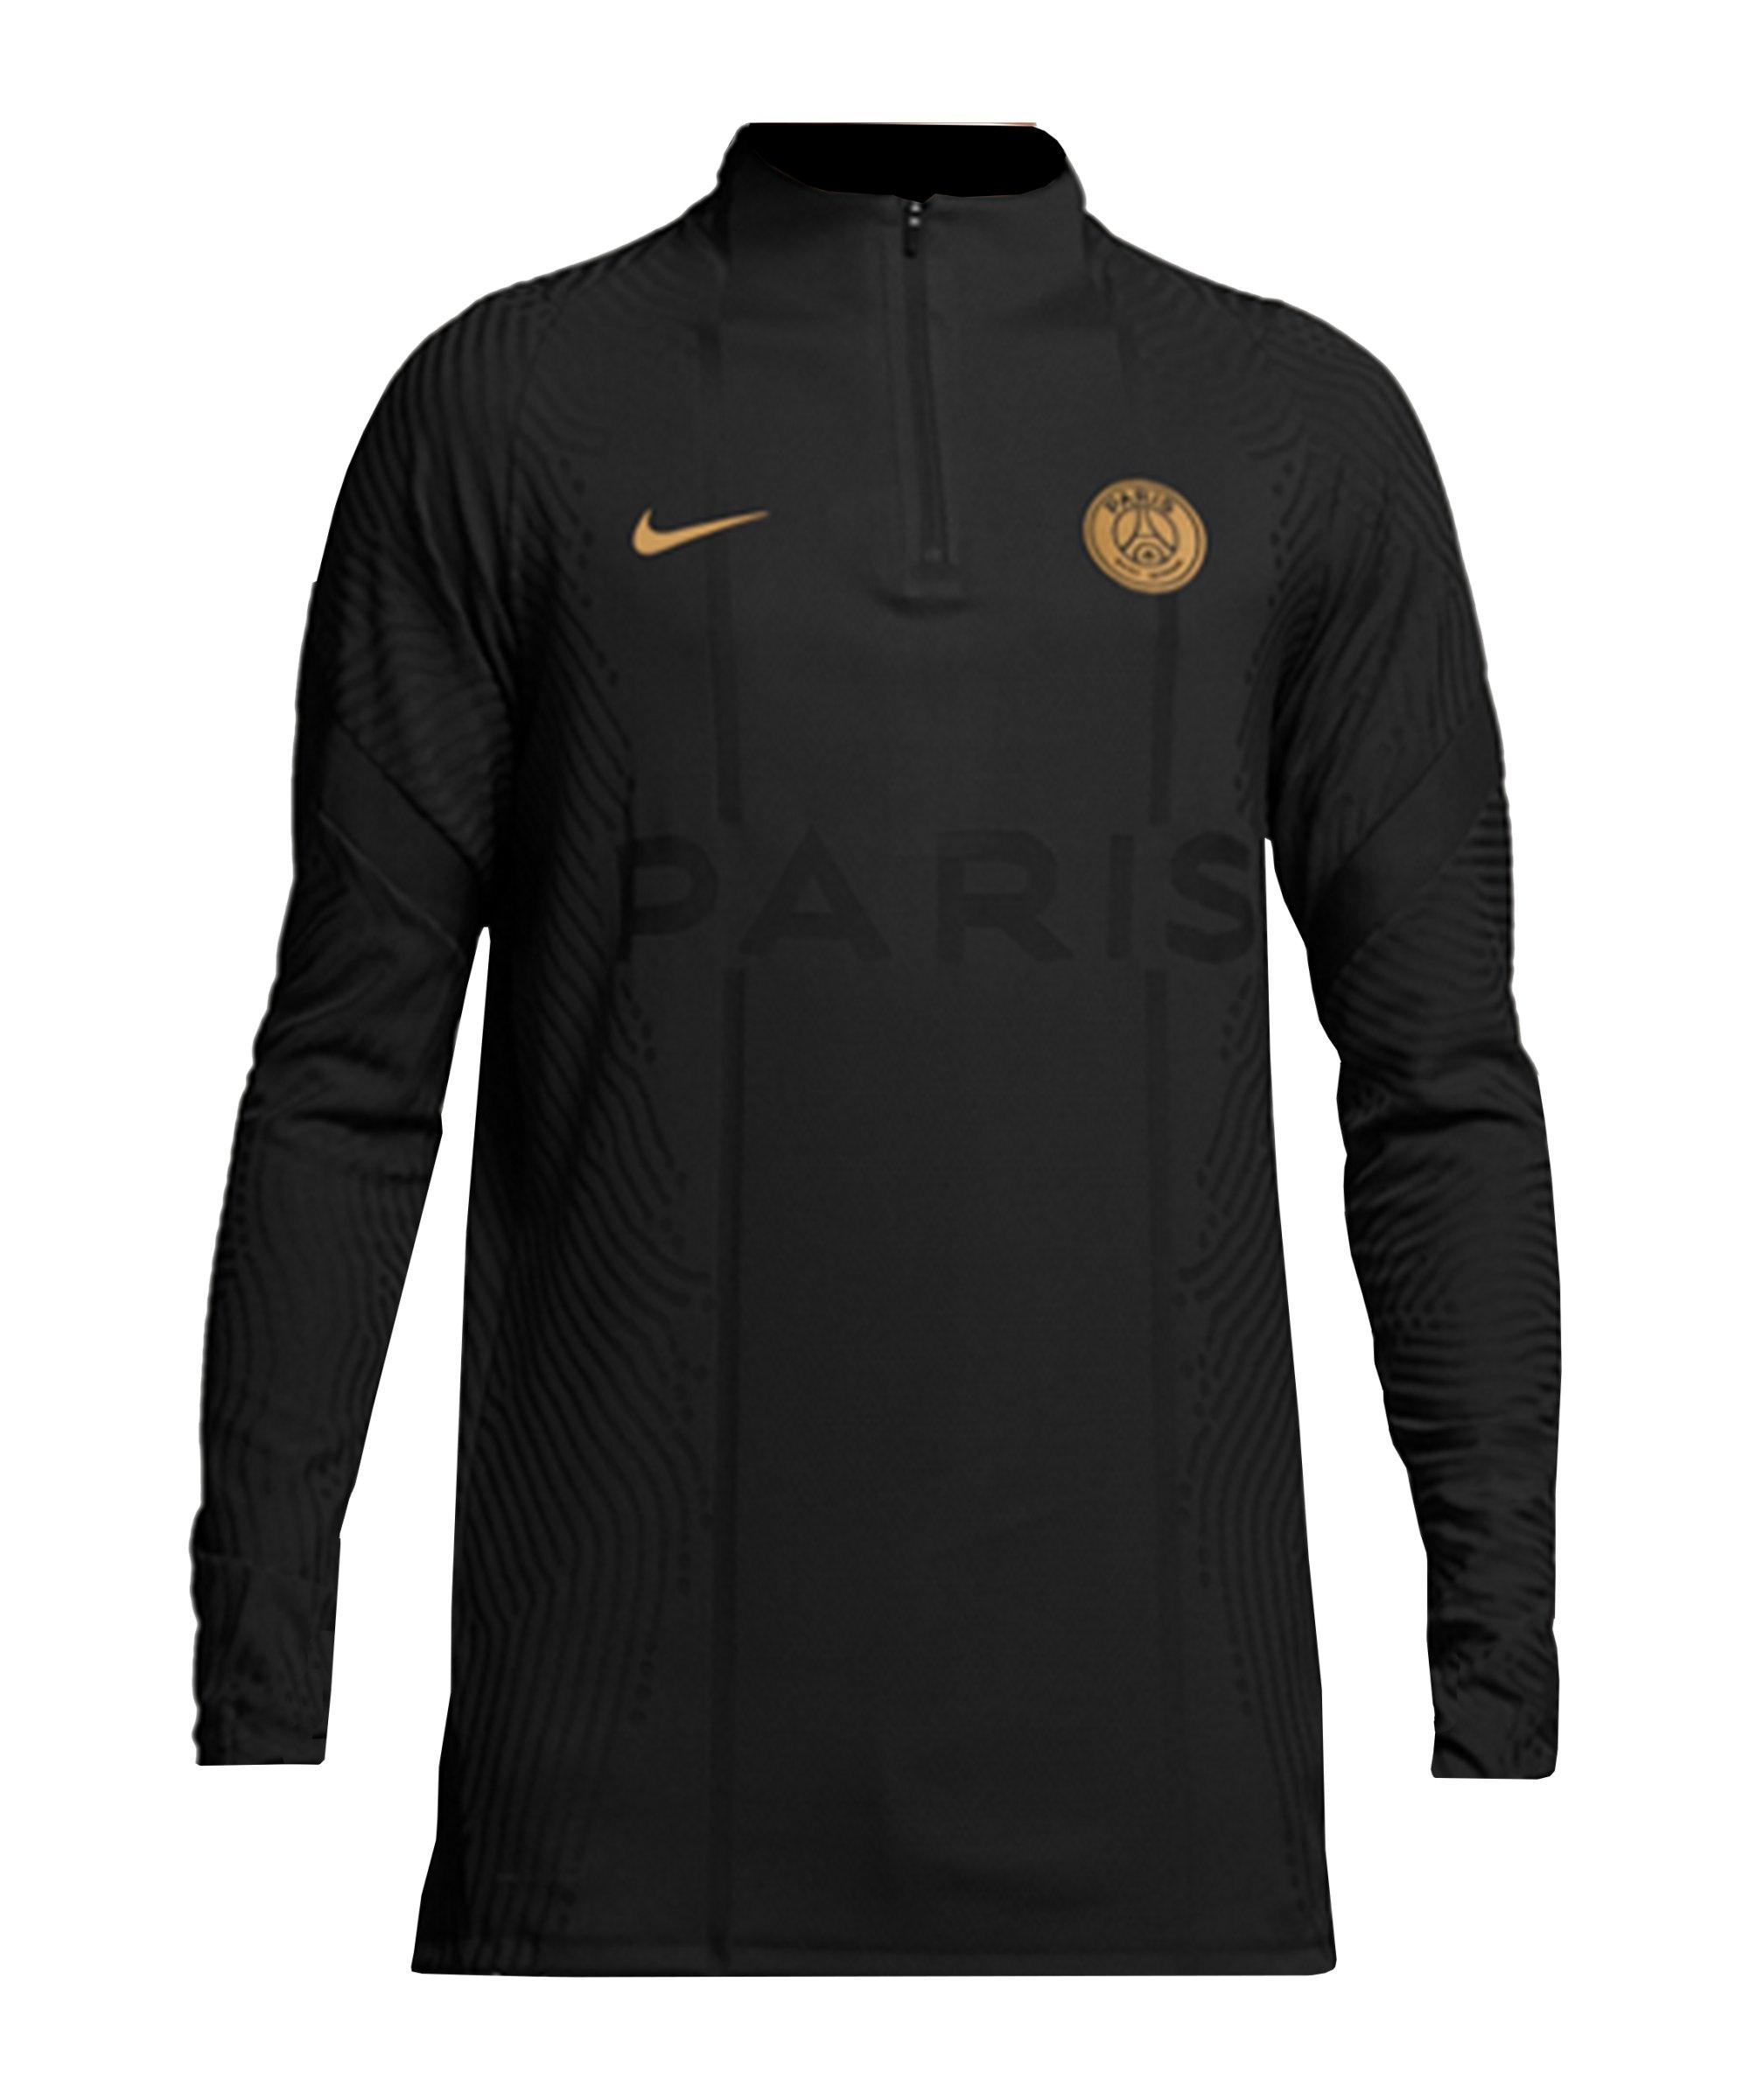 Nike Paris St. Germain Vaporknit Drill Top F010 - schwarz